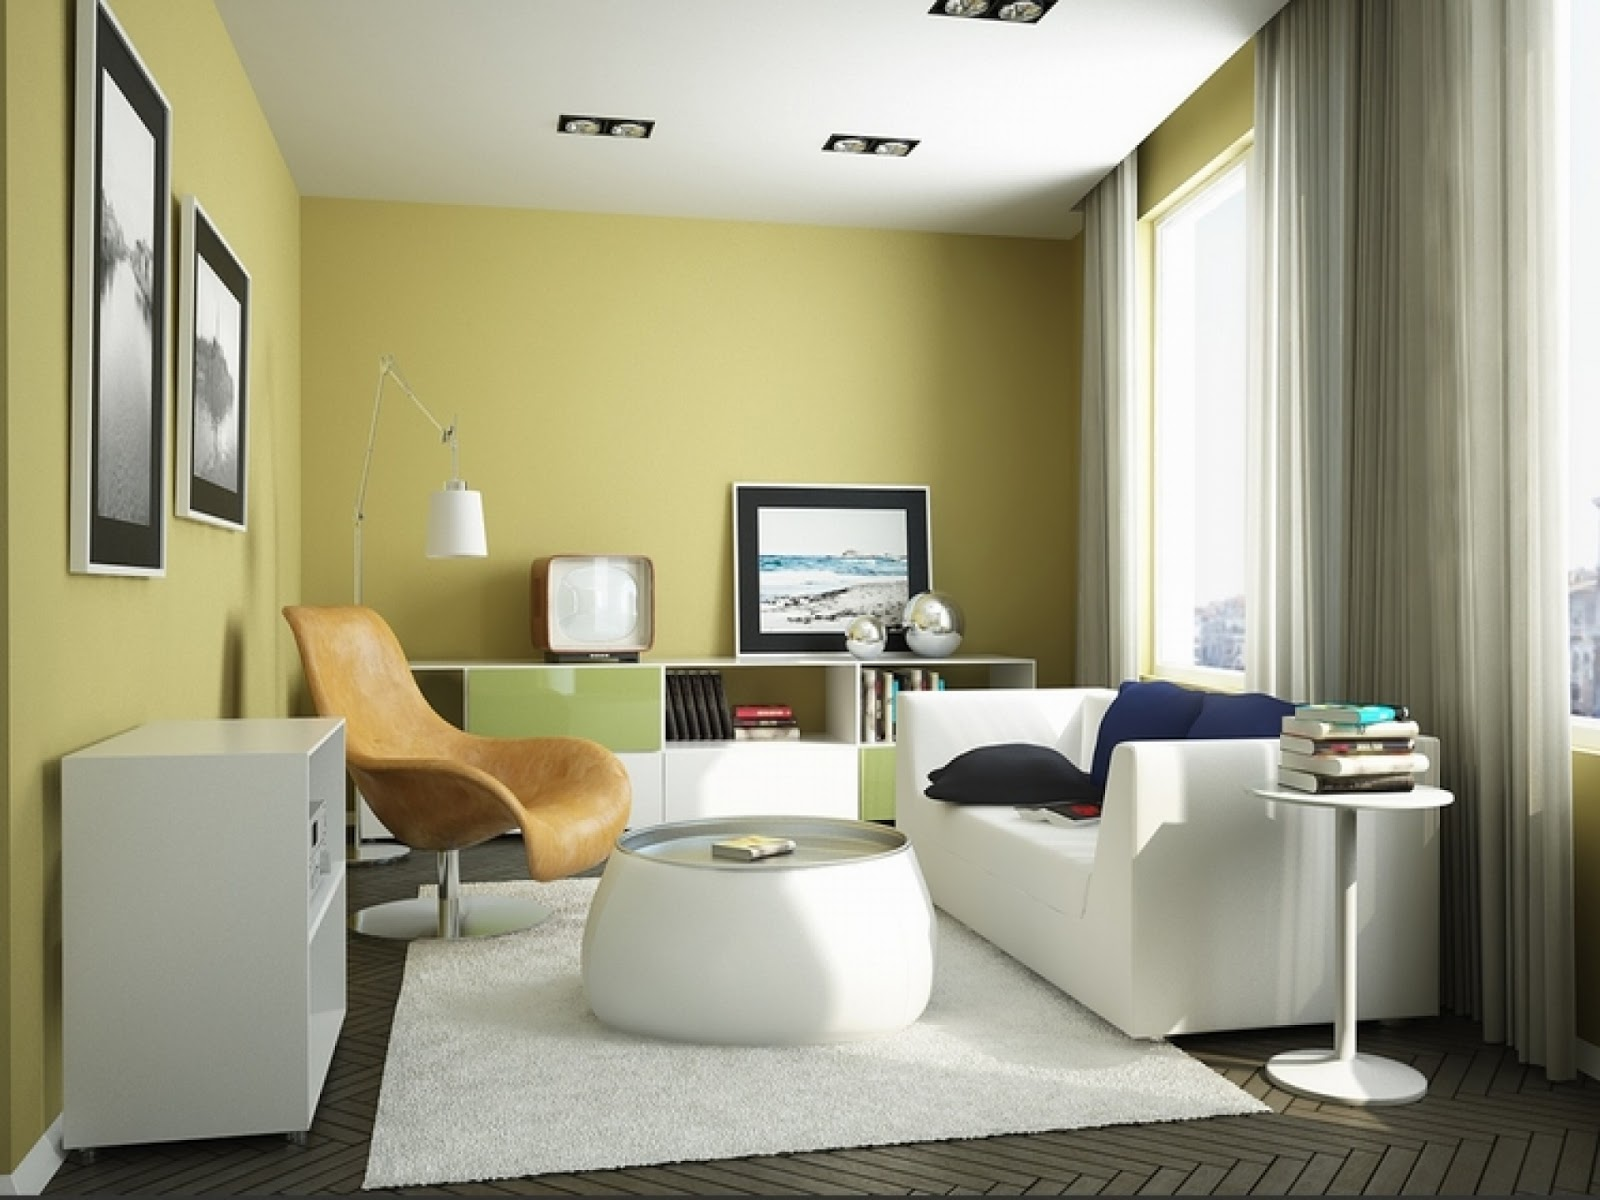 10 small house interior design ideas philippines